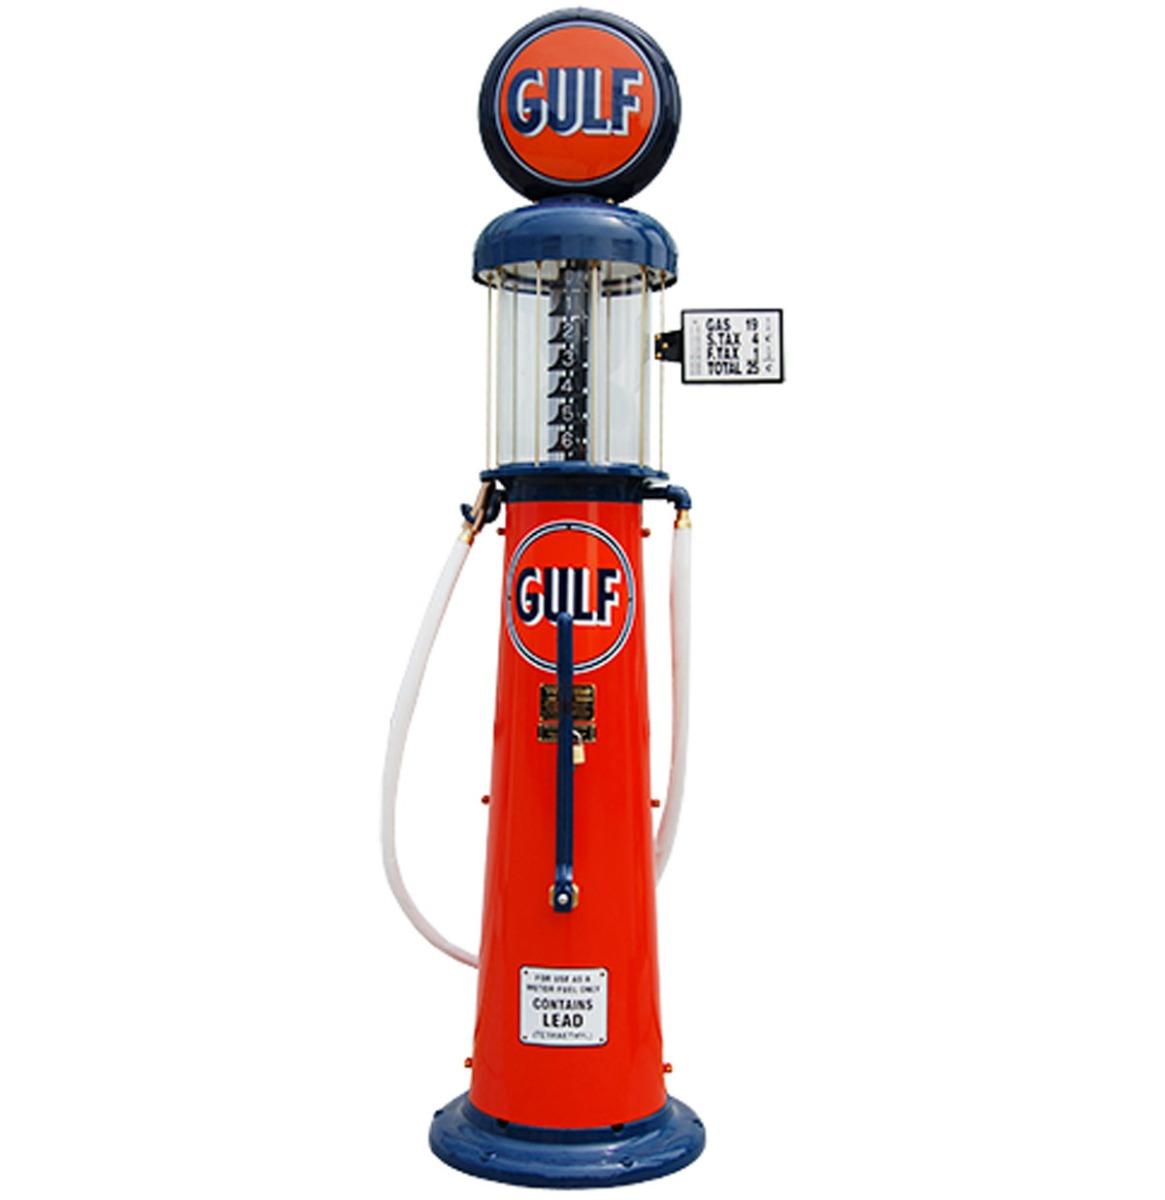 Wayne 615 Gulf 6 Gallon Benzinepomp - Oranje & Blauw - Reproductie